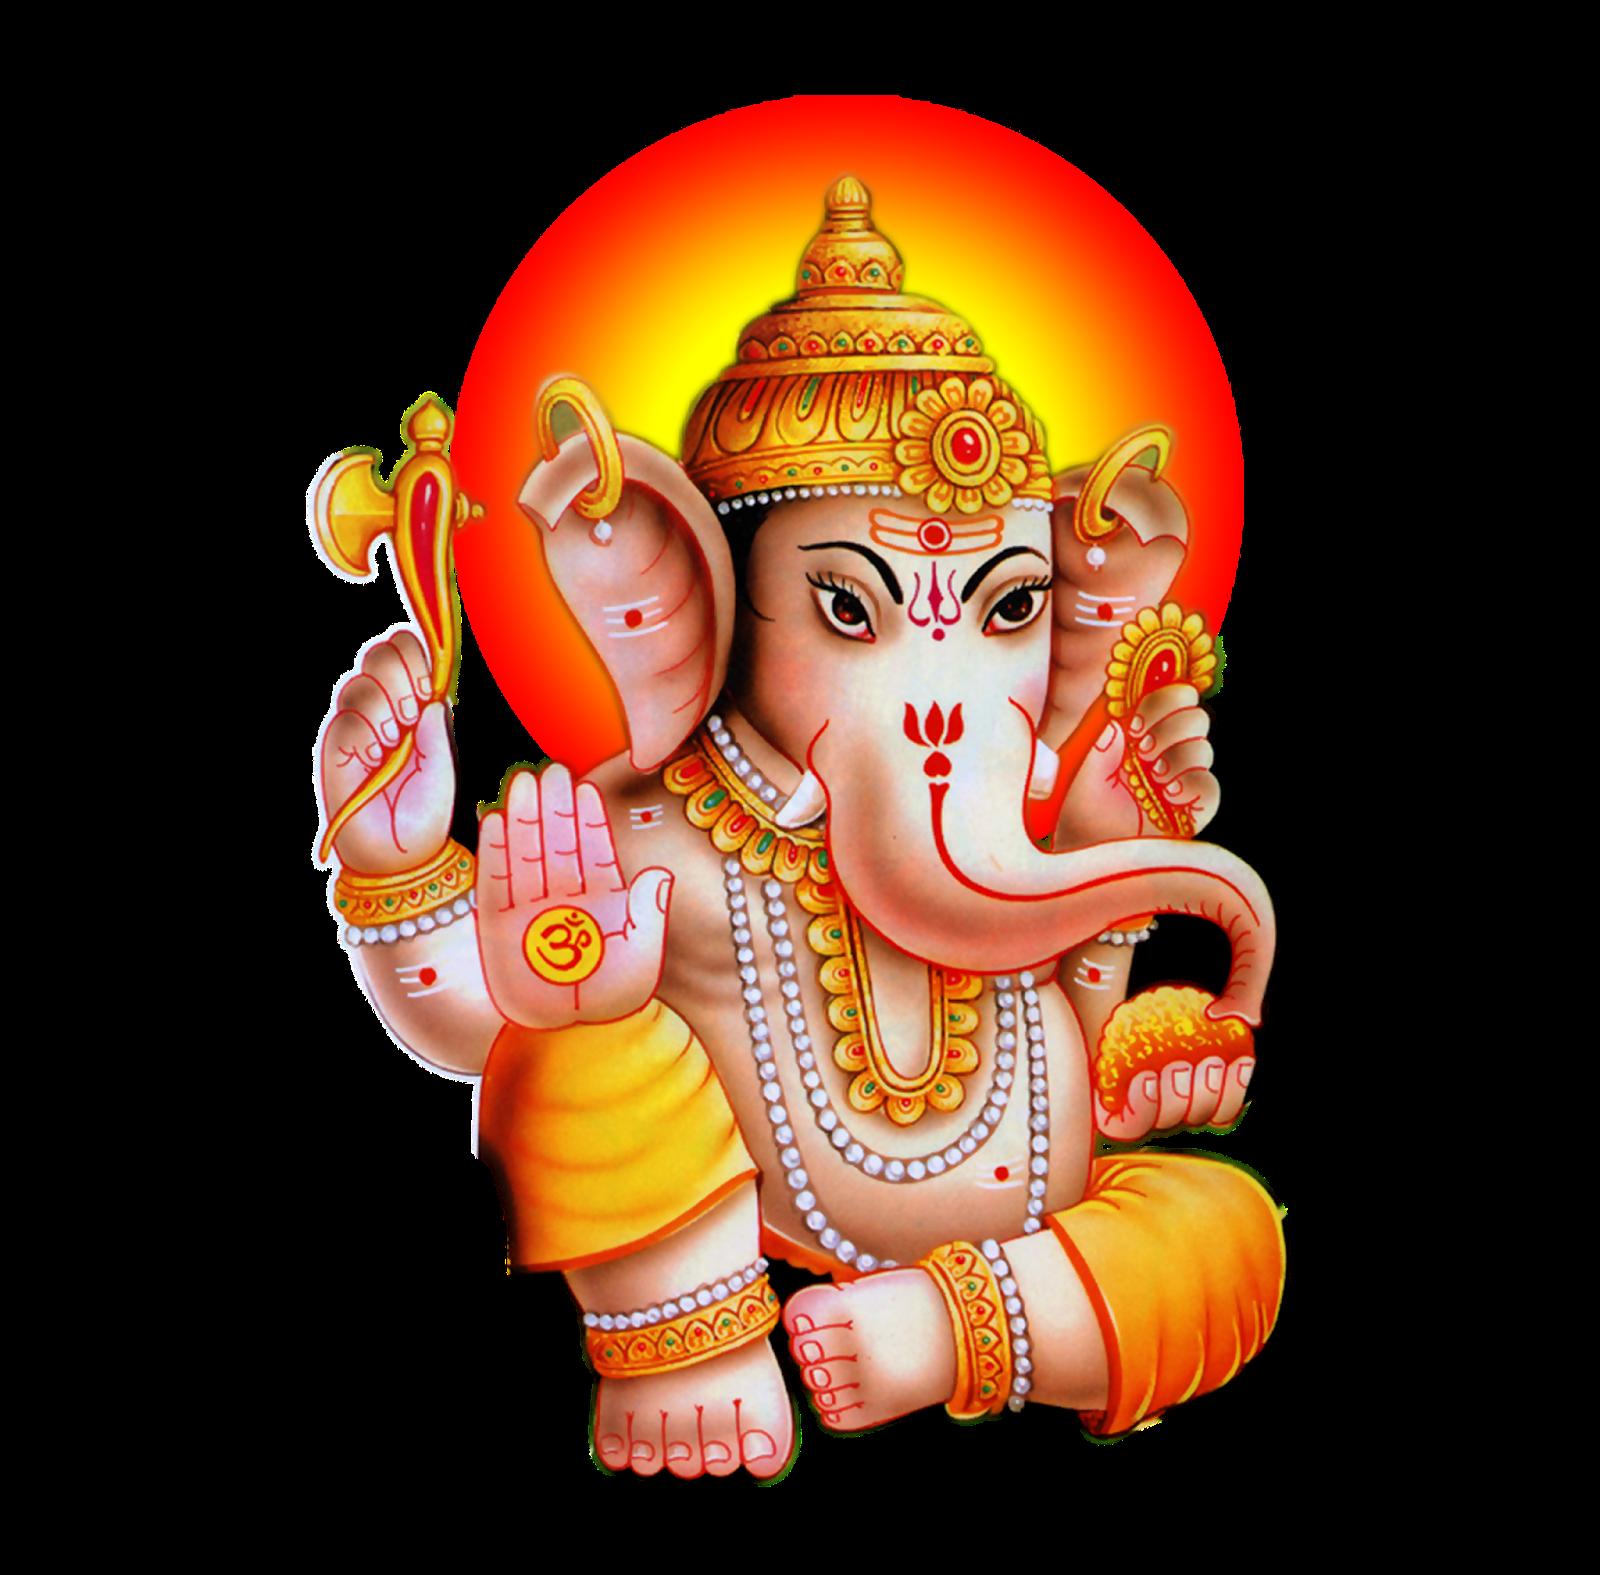 Sri Ganesh Hd Png Pluspng Com 1600 Sri Ganesh Hd Png Ganesh Photo Ganesha Pictures Ganesh Images